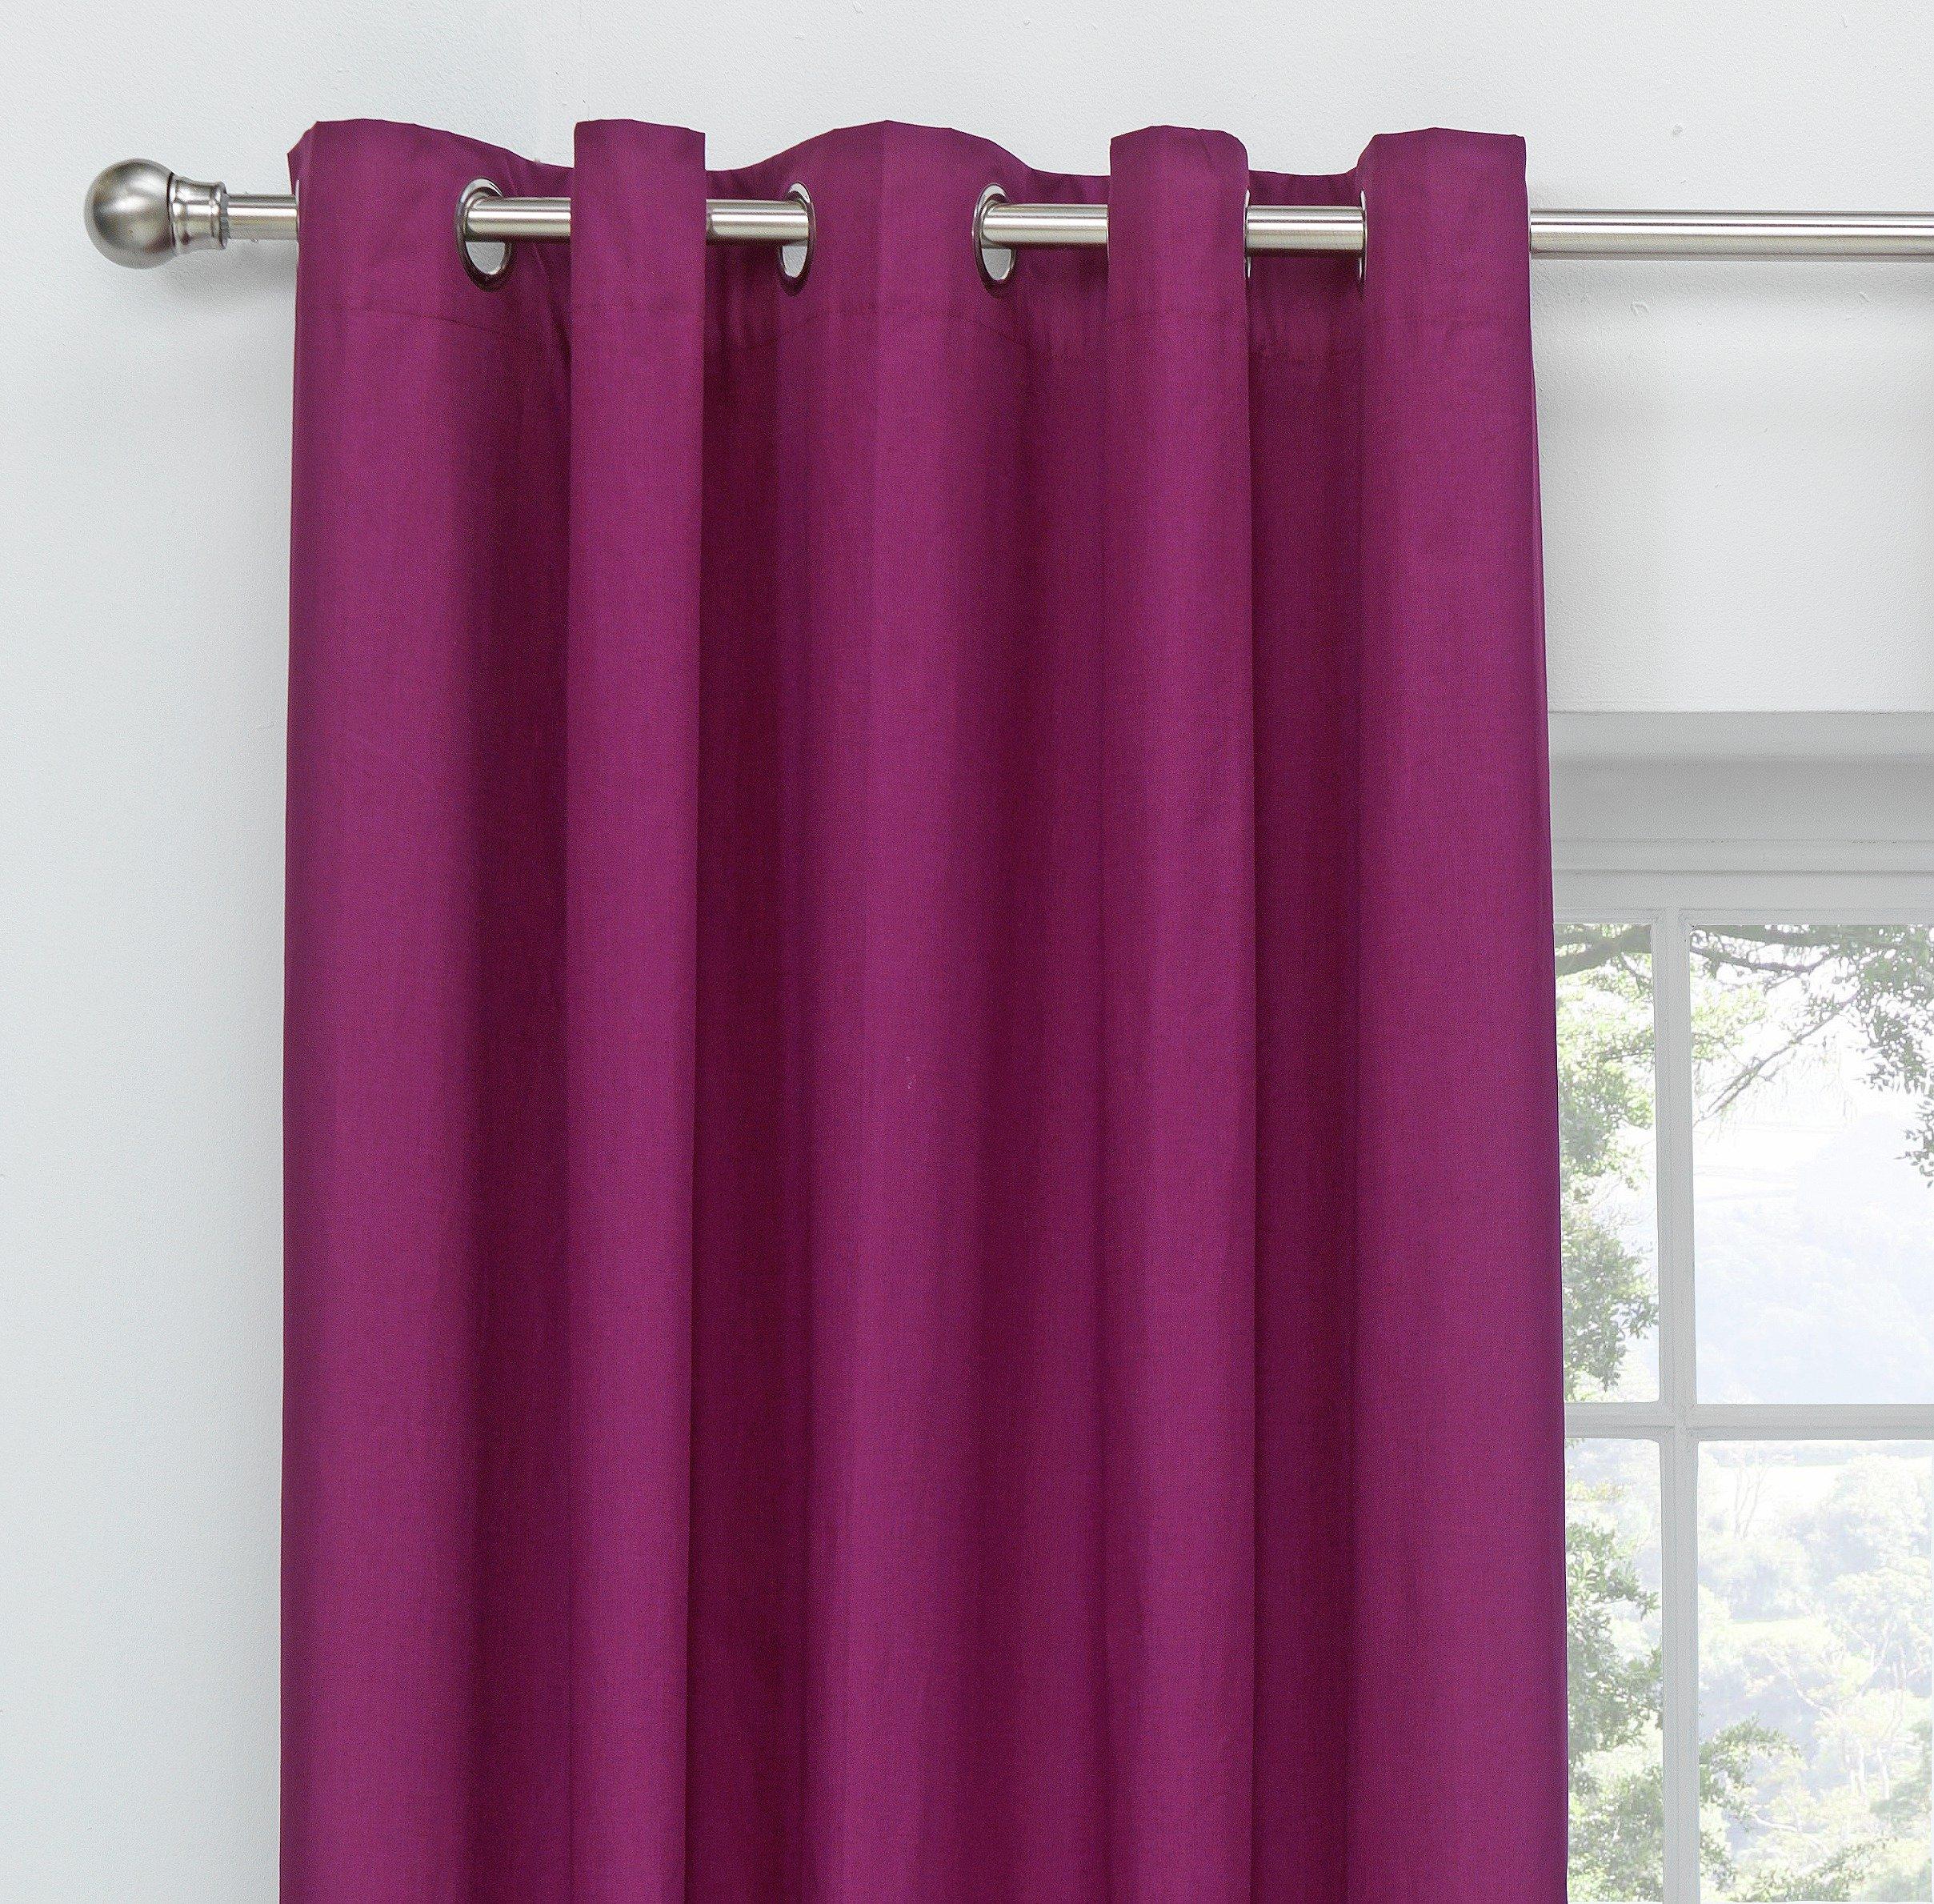 Image of ColourMatch Blackout Eyelet Curtains - 117x183cm - Grape